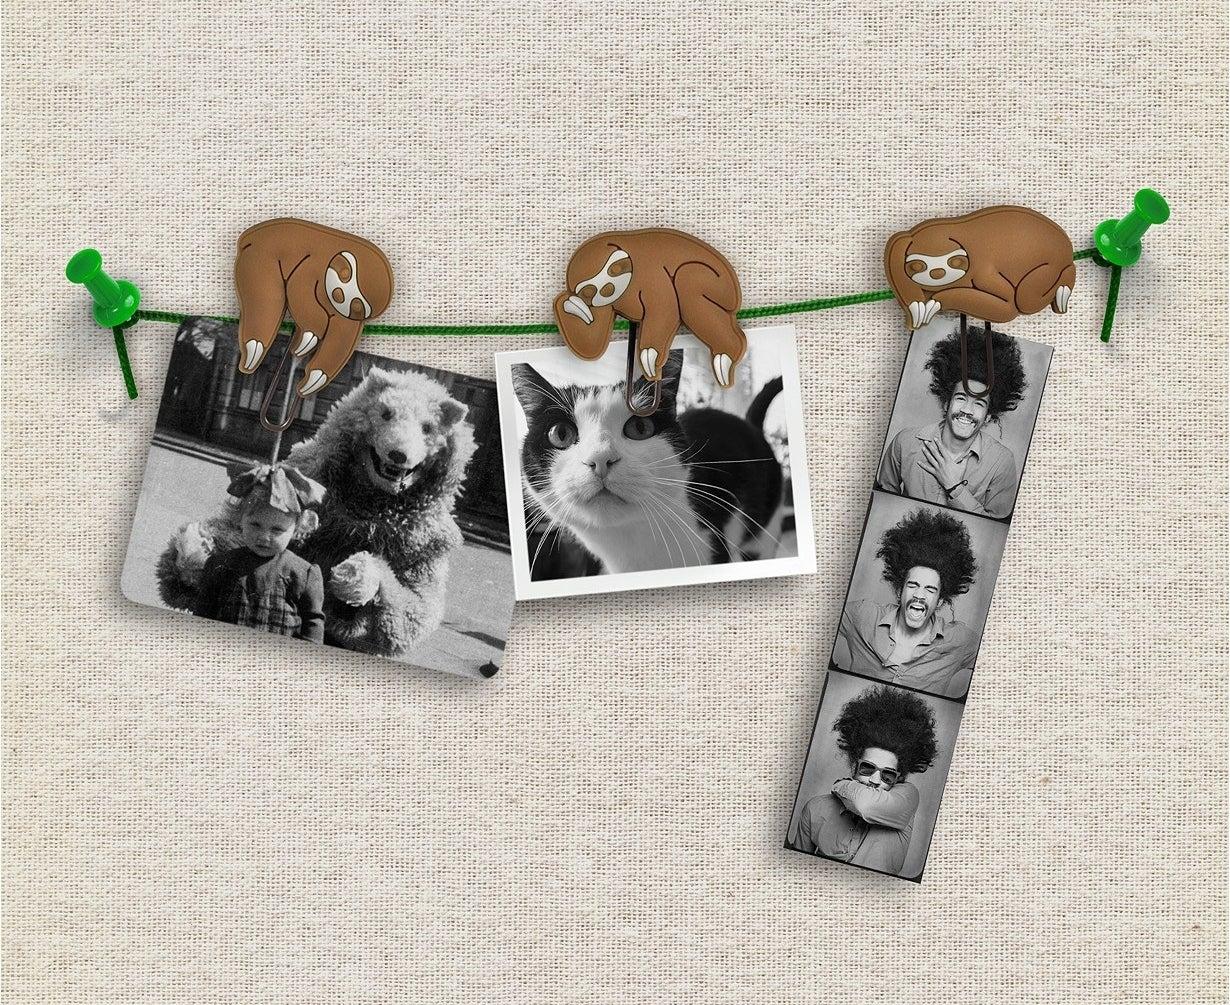 Three sloth hangers on the vine